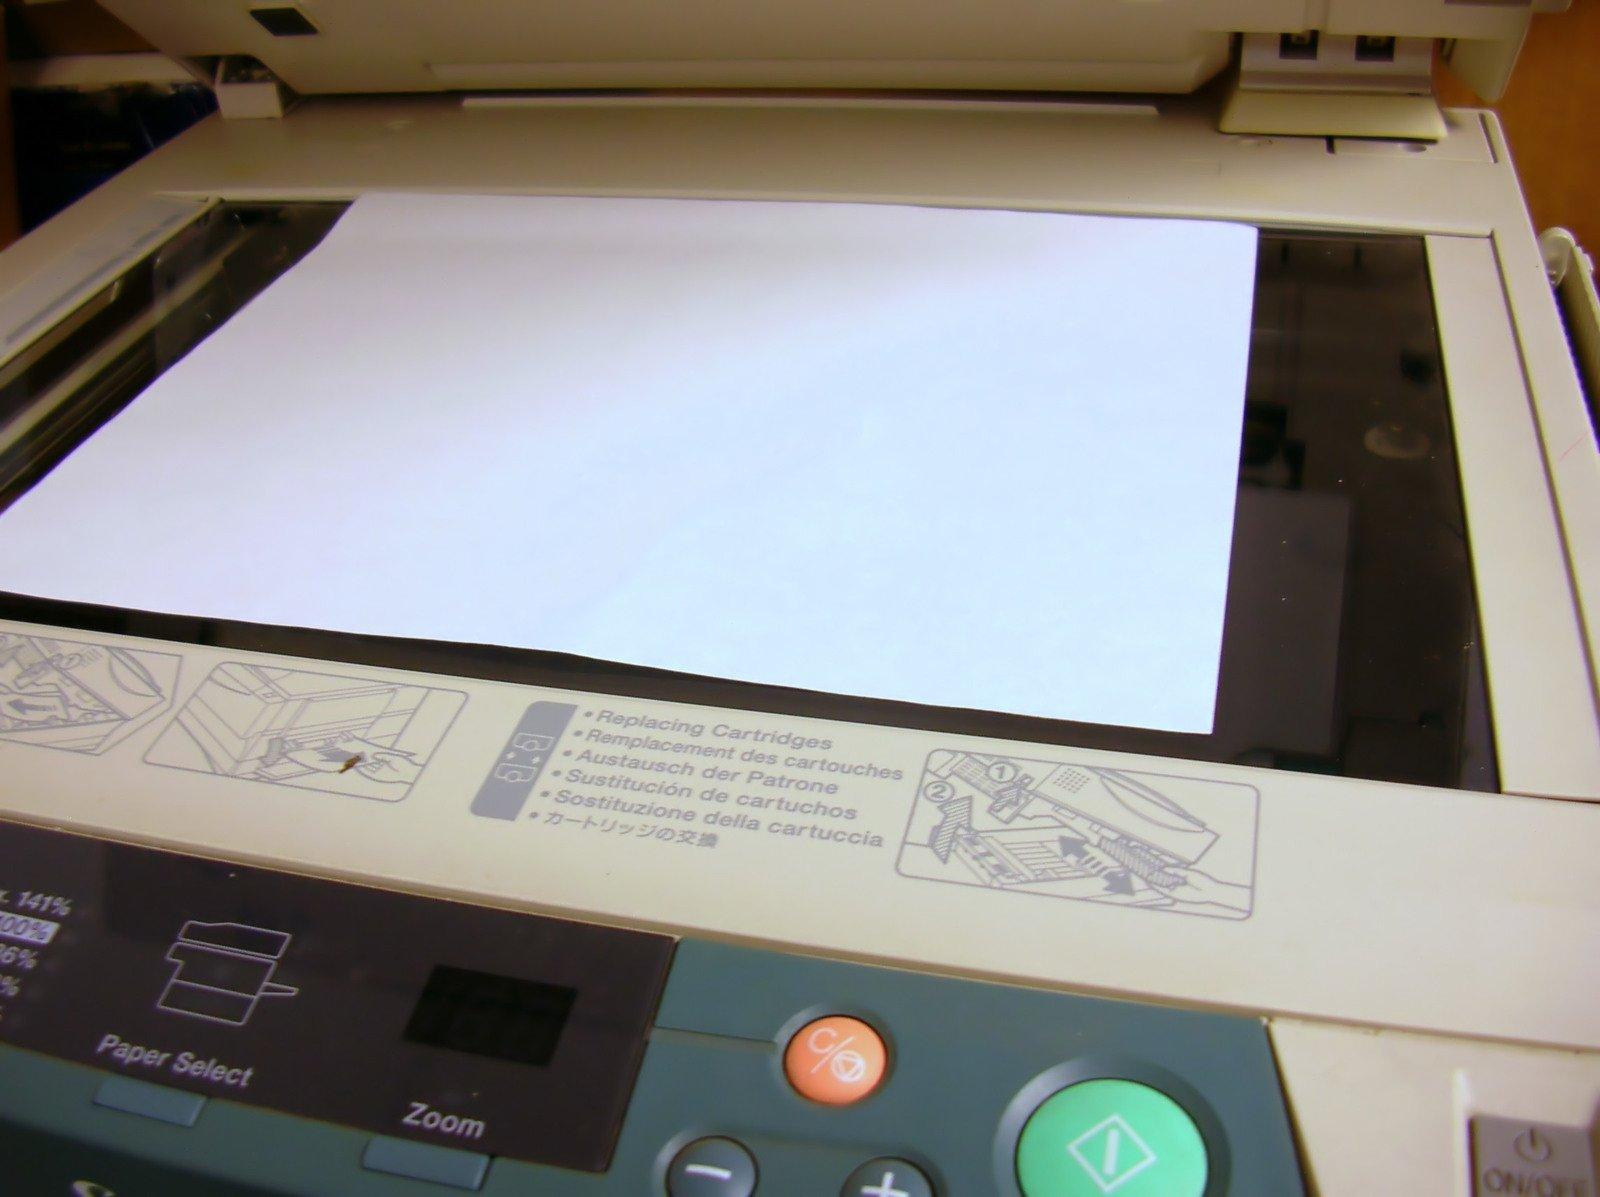 nowoczesna drukarka laserowa